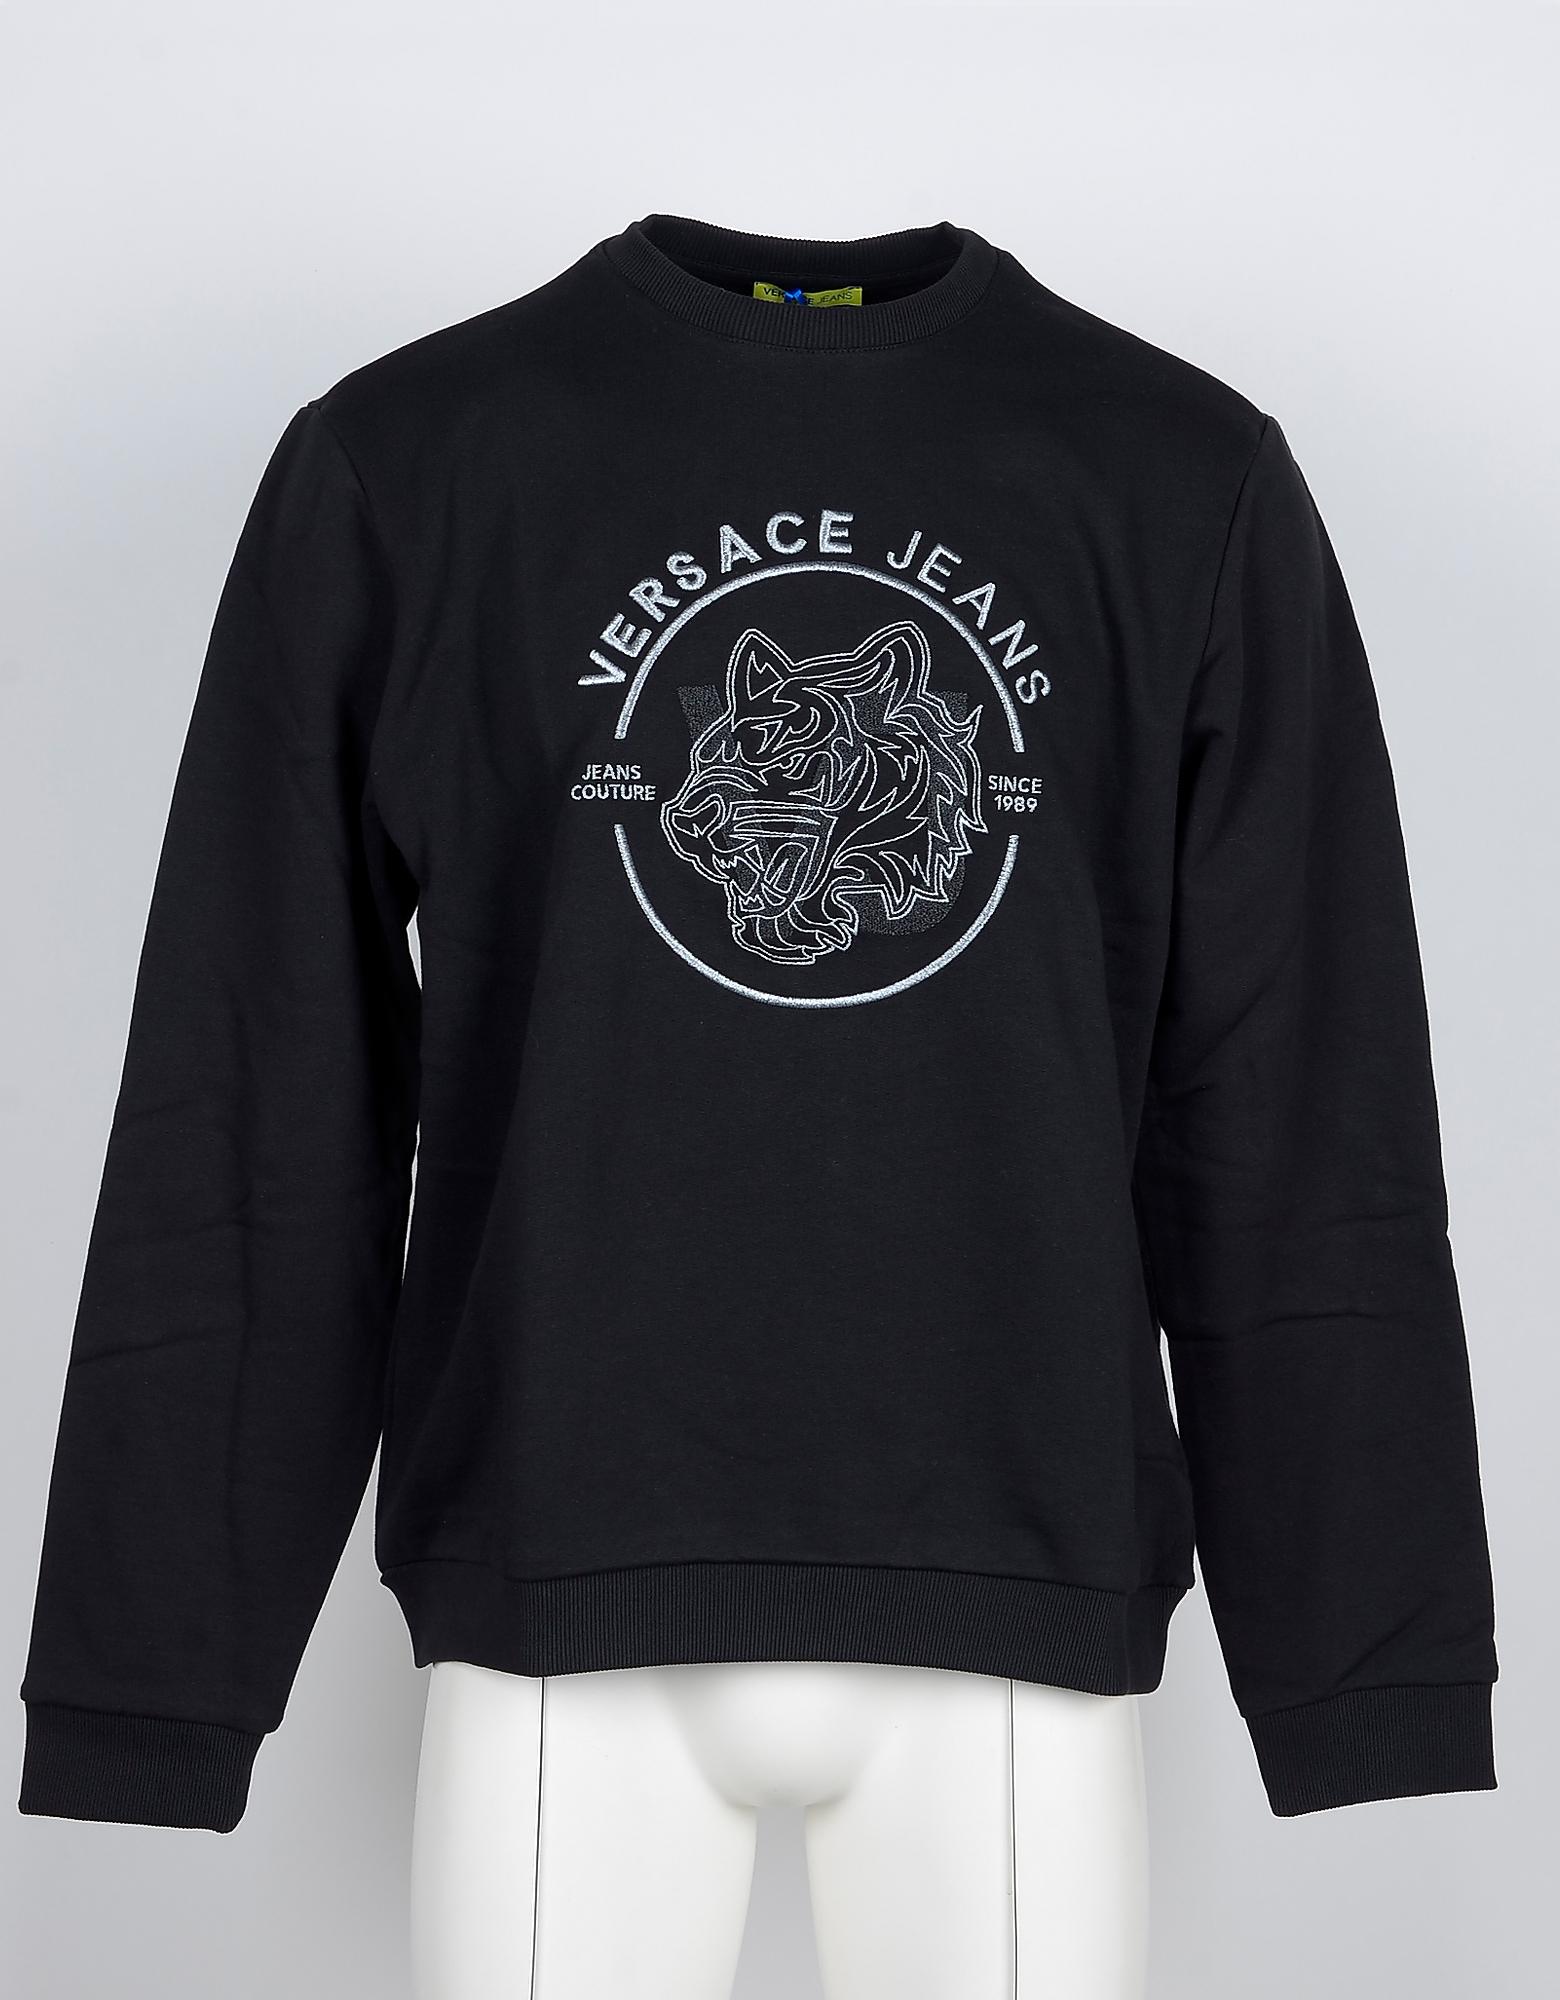 Versace Jeans Designer Sweatshirts, Black Cotton Signature Men's Sweatshirt